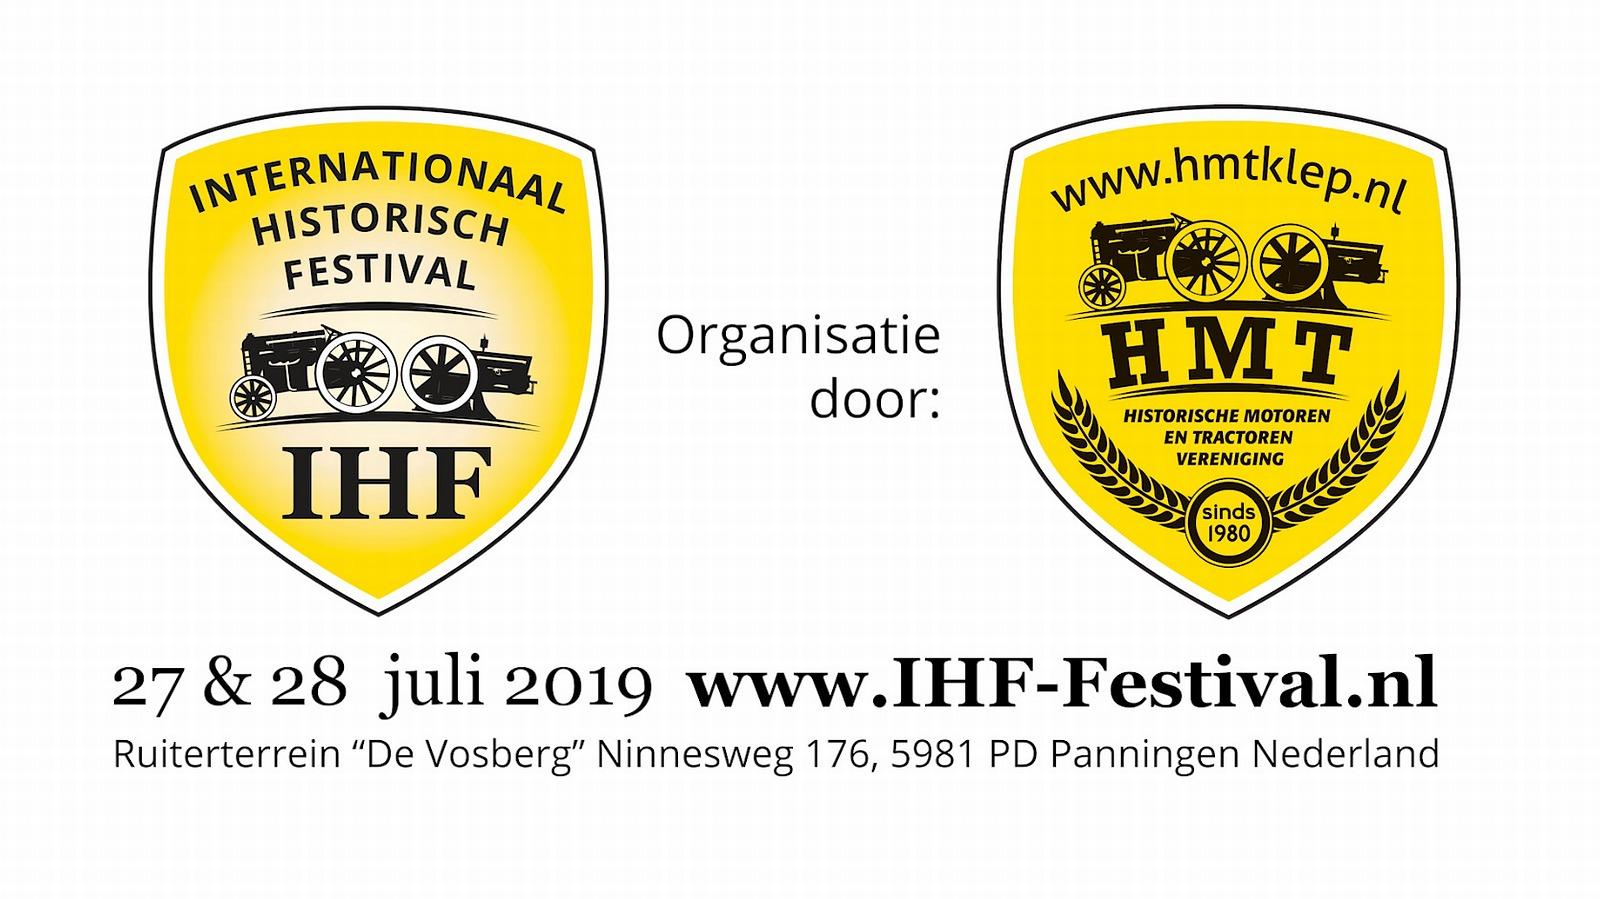 40e Internationaal Historisch Festival te Panningen • 27 & 28-07-2019